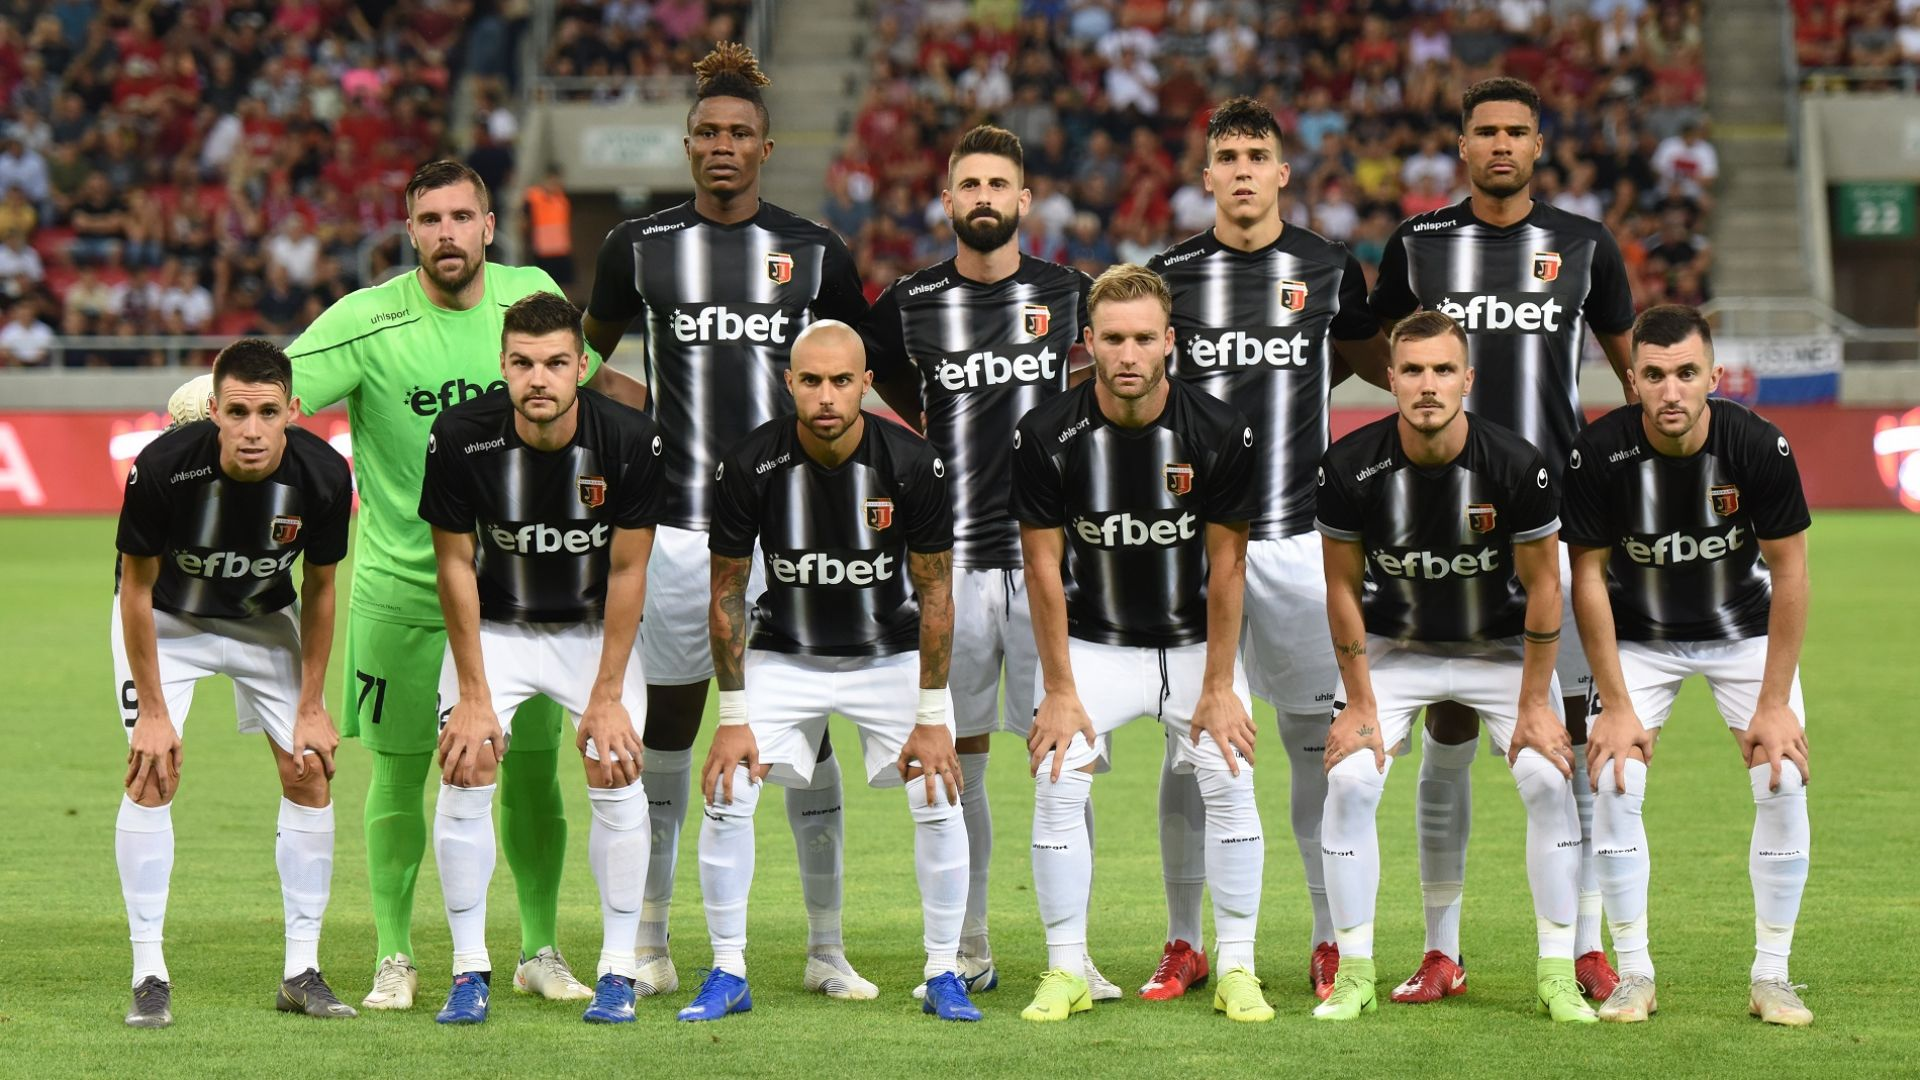 Европейски грандове чакат ЦСКА и Локо при победи в Европа